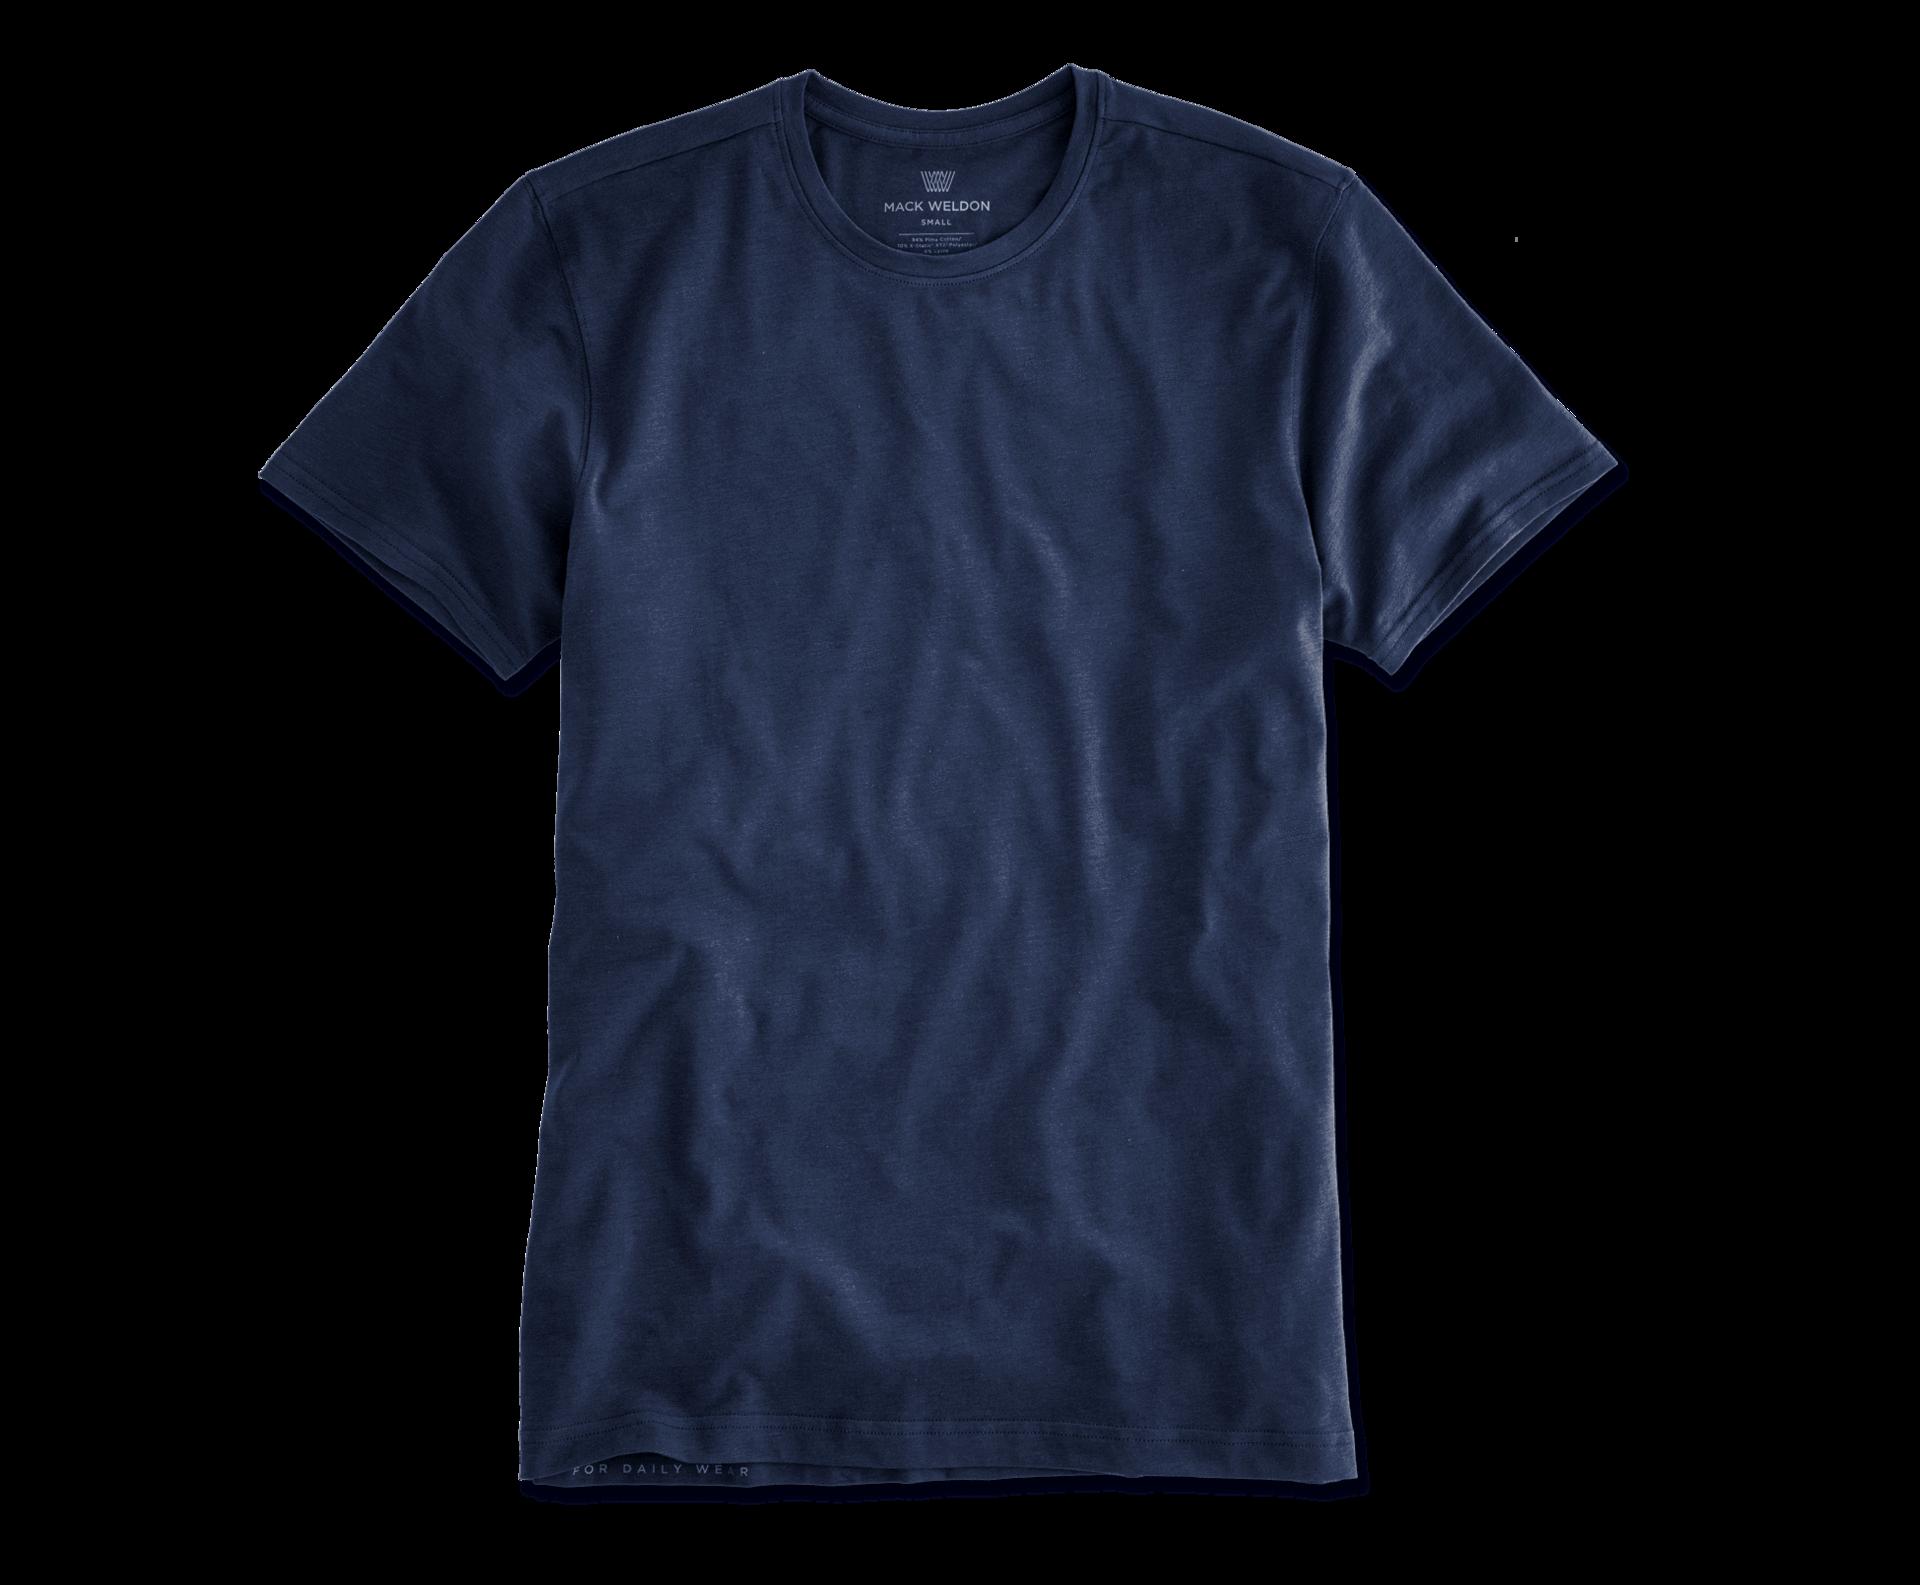 Mack Weldon Silver Crew Neck T-Shirt in navy; slim fit T-shirts